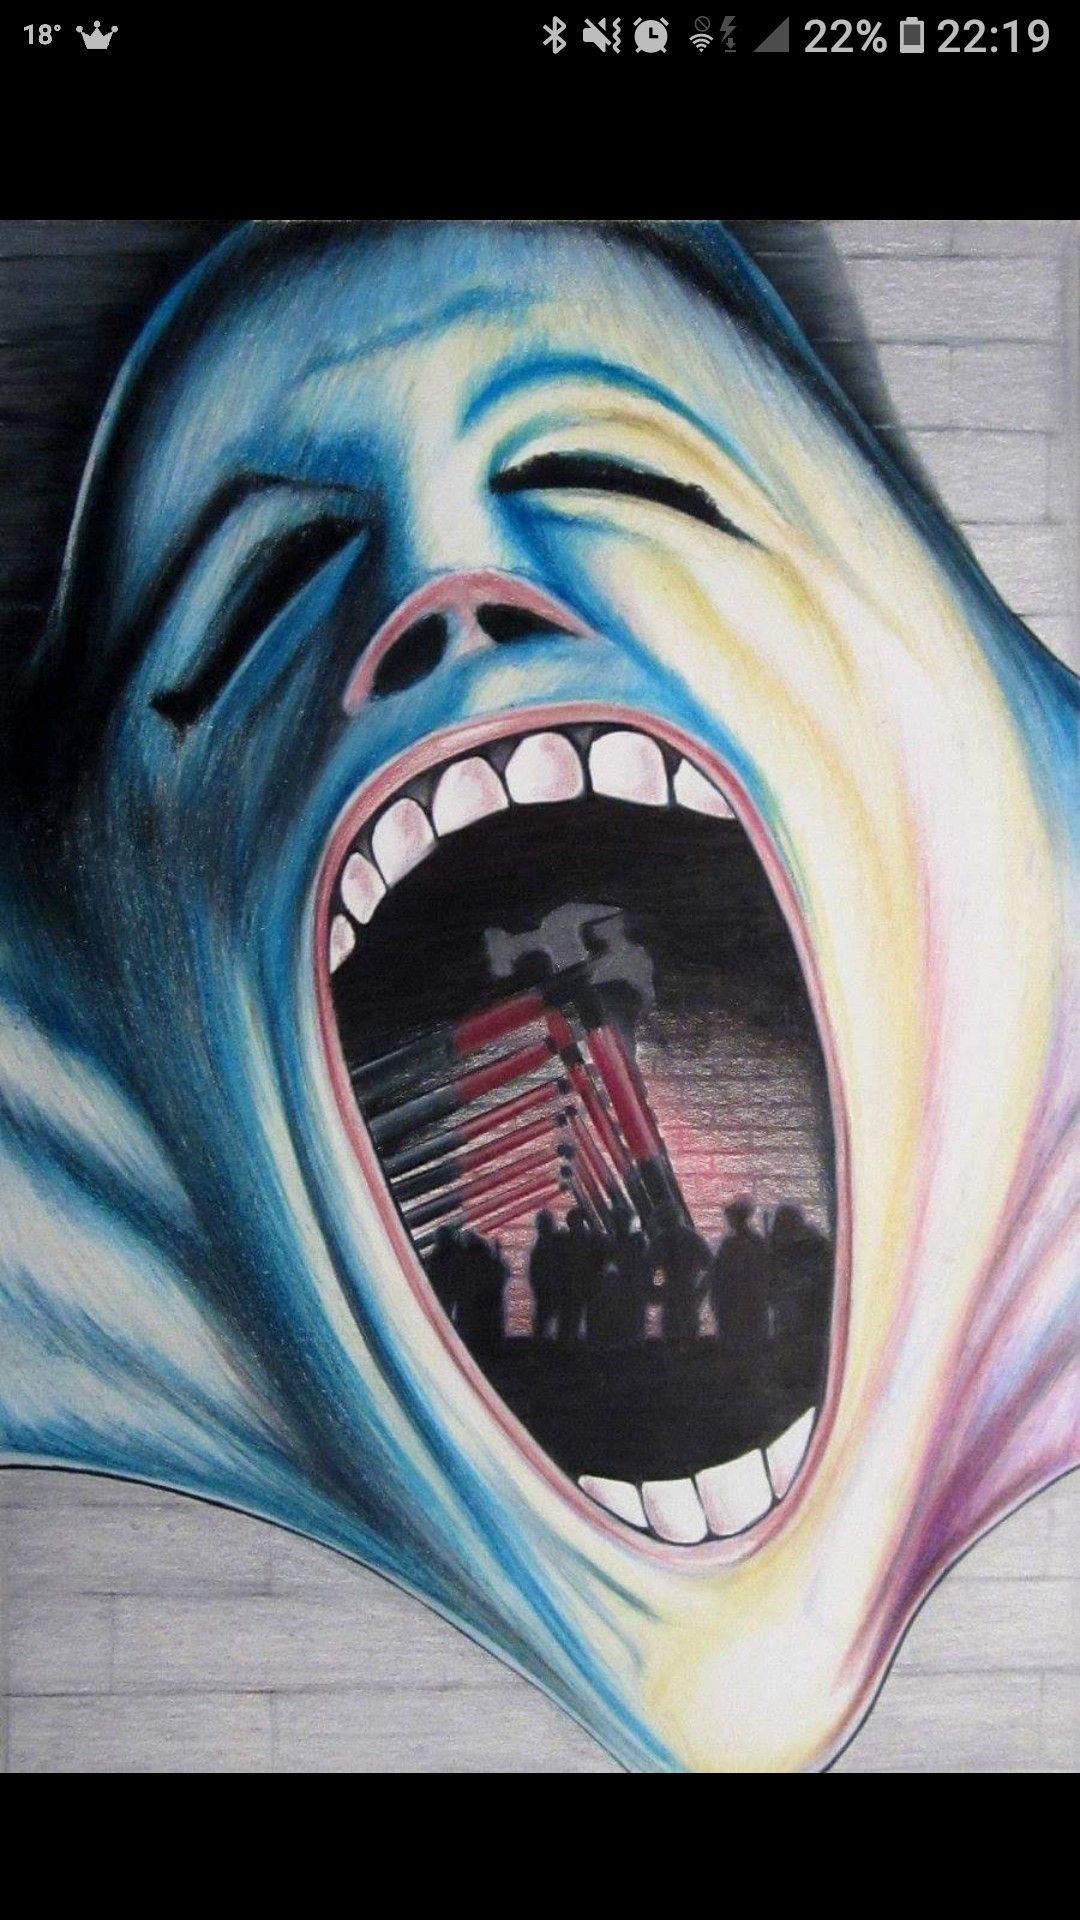 Pin by Karen Mengel on pink floyd lyrics Pink floyd